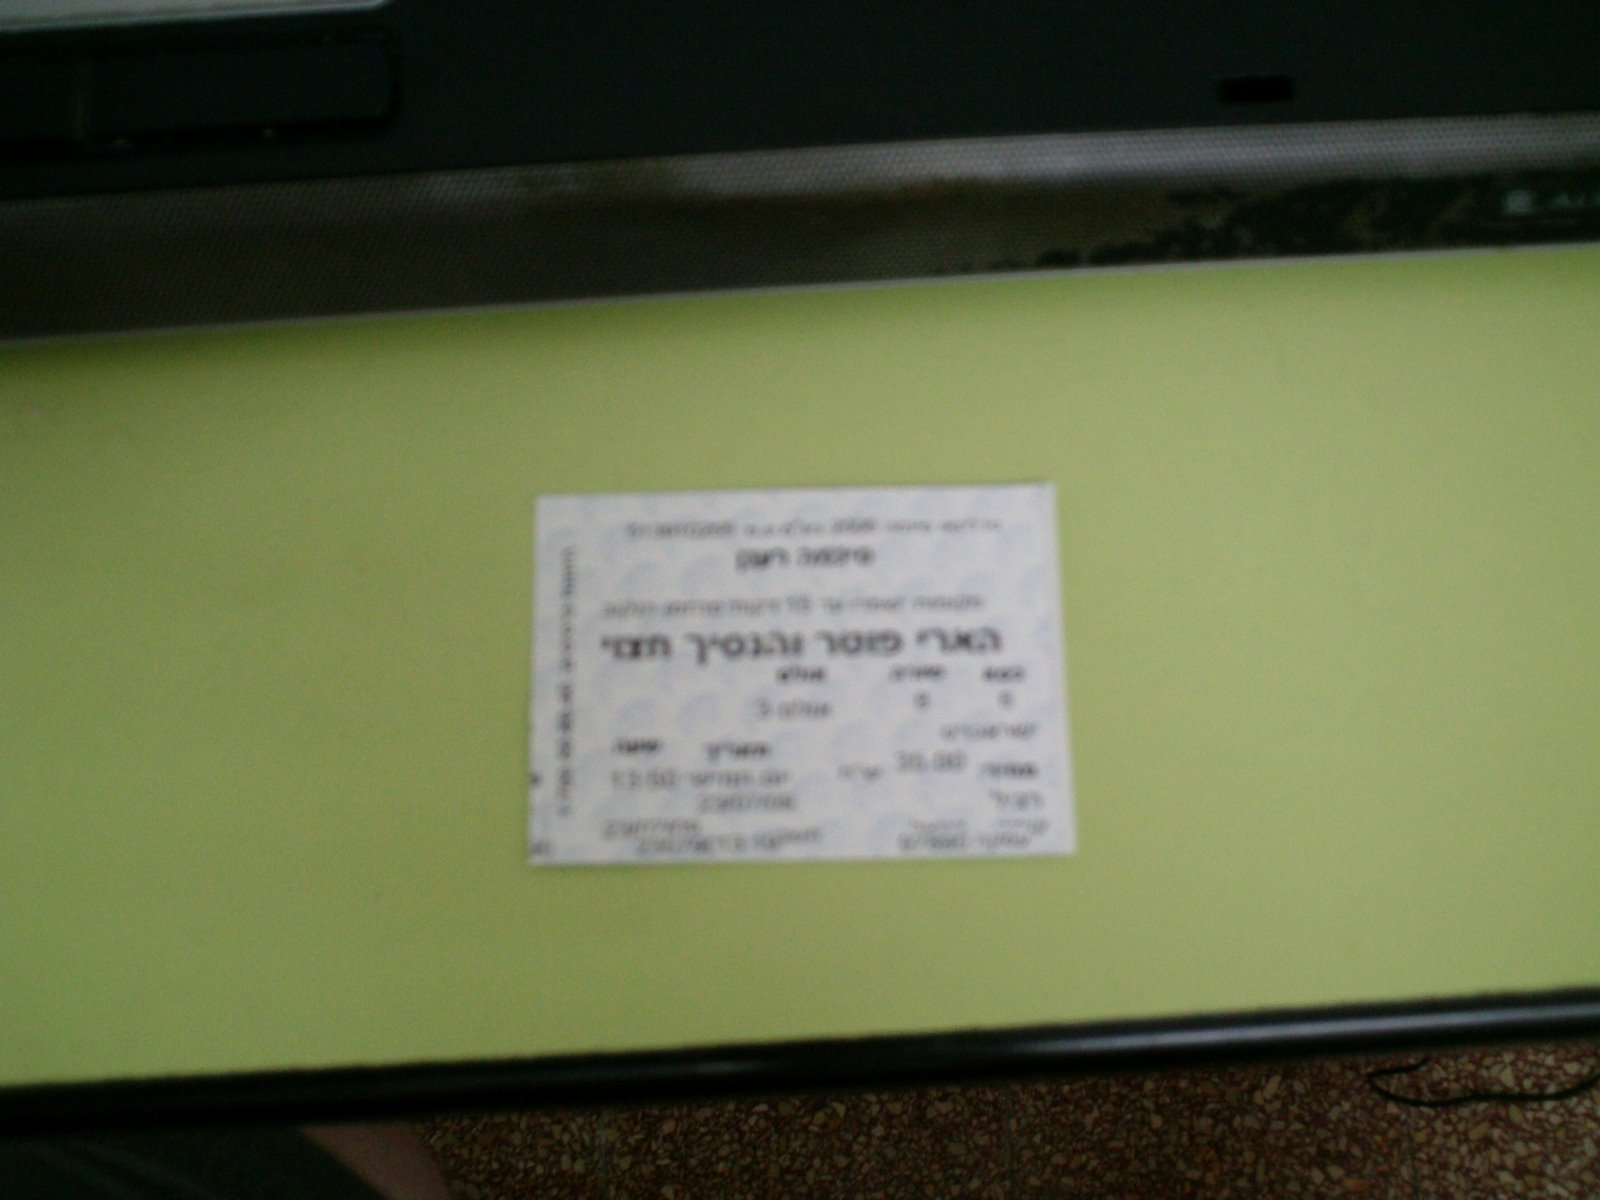 [Harry+Potter+Ticket.JPG]